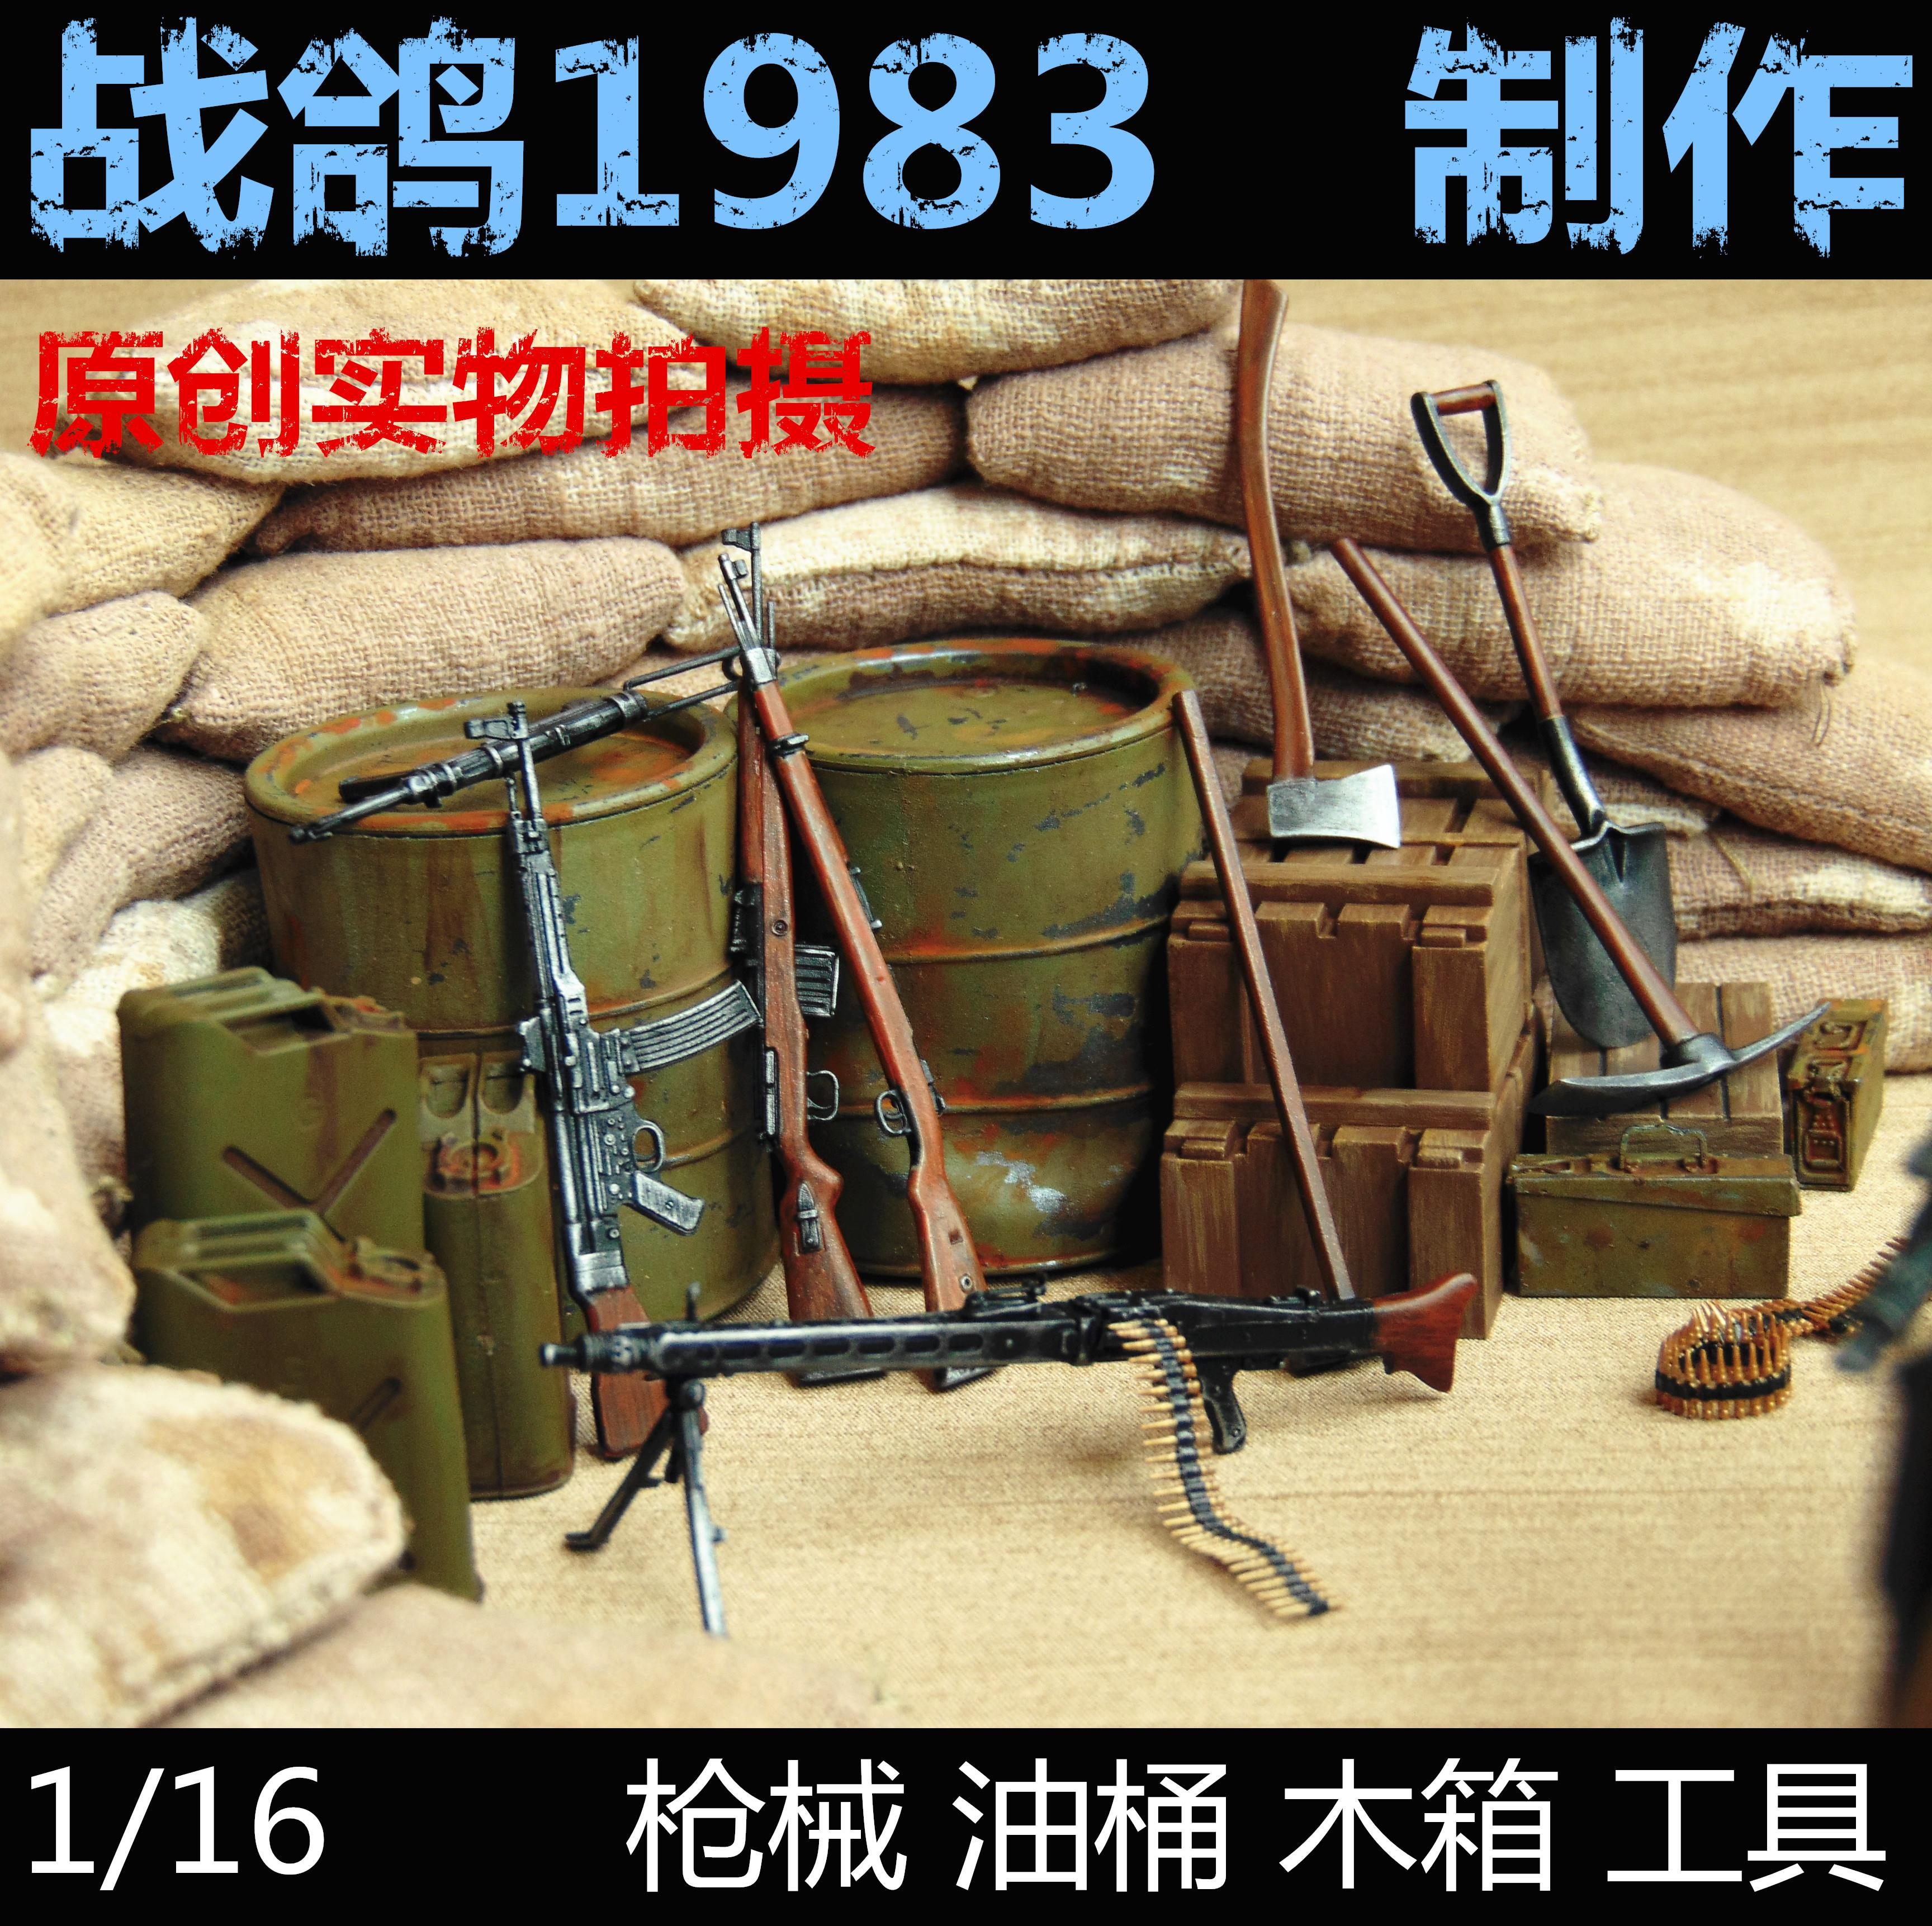 1/16 KNL HOBBY Soldier tank machine gun rifle sandbag bunker scene drums wooden model scenario Accessories knl hobby voyager model pe35866 modern us military mim 104c patriot 1 launch platform basic transformation pieces